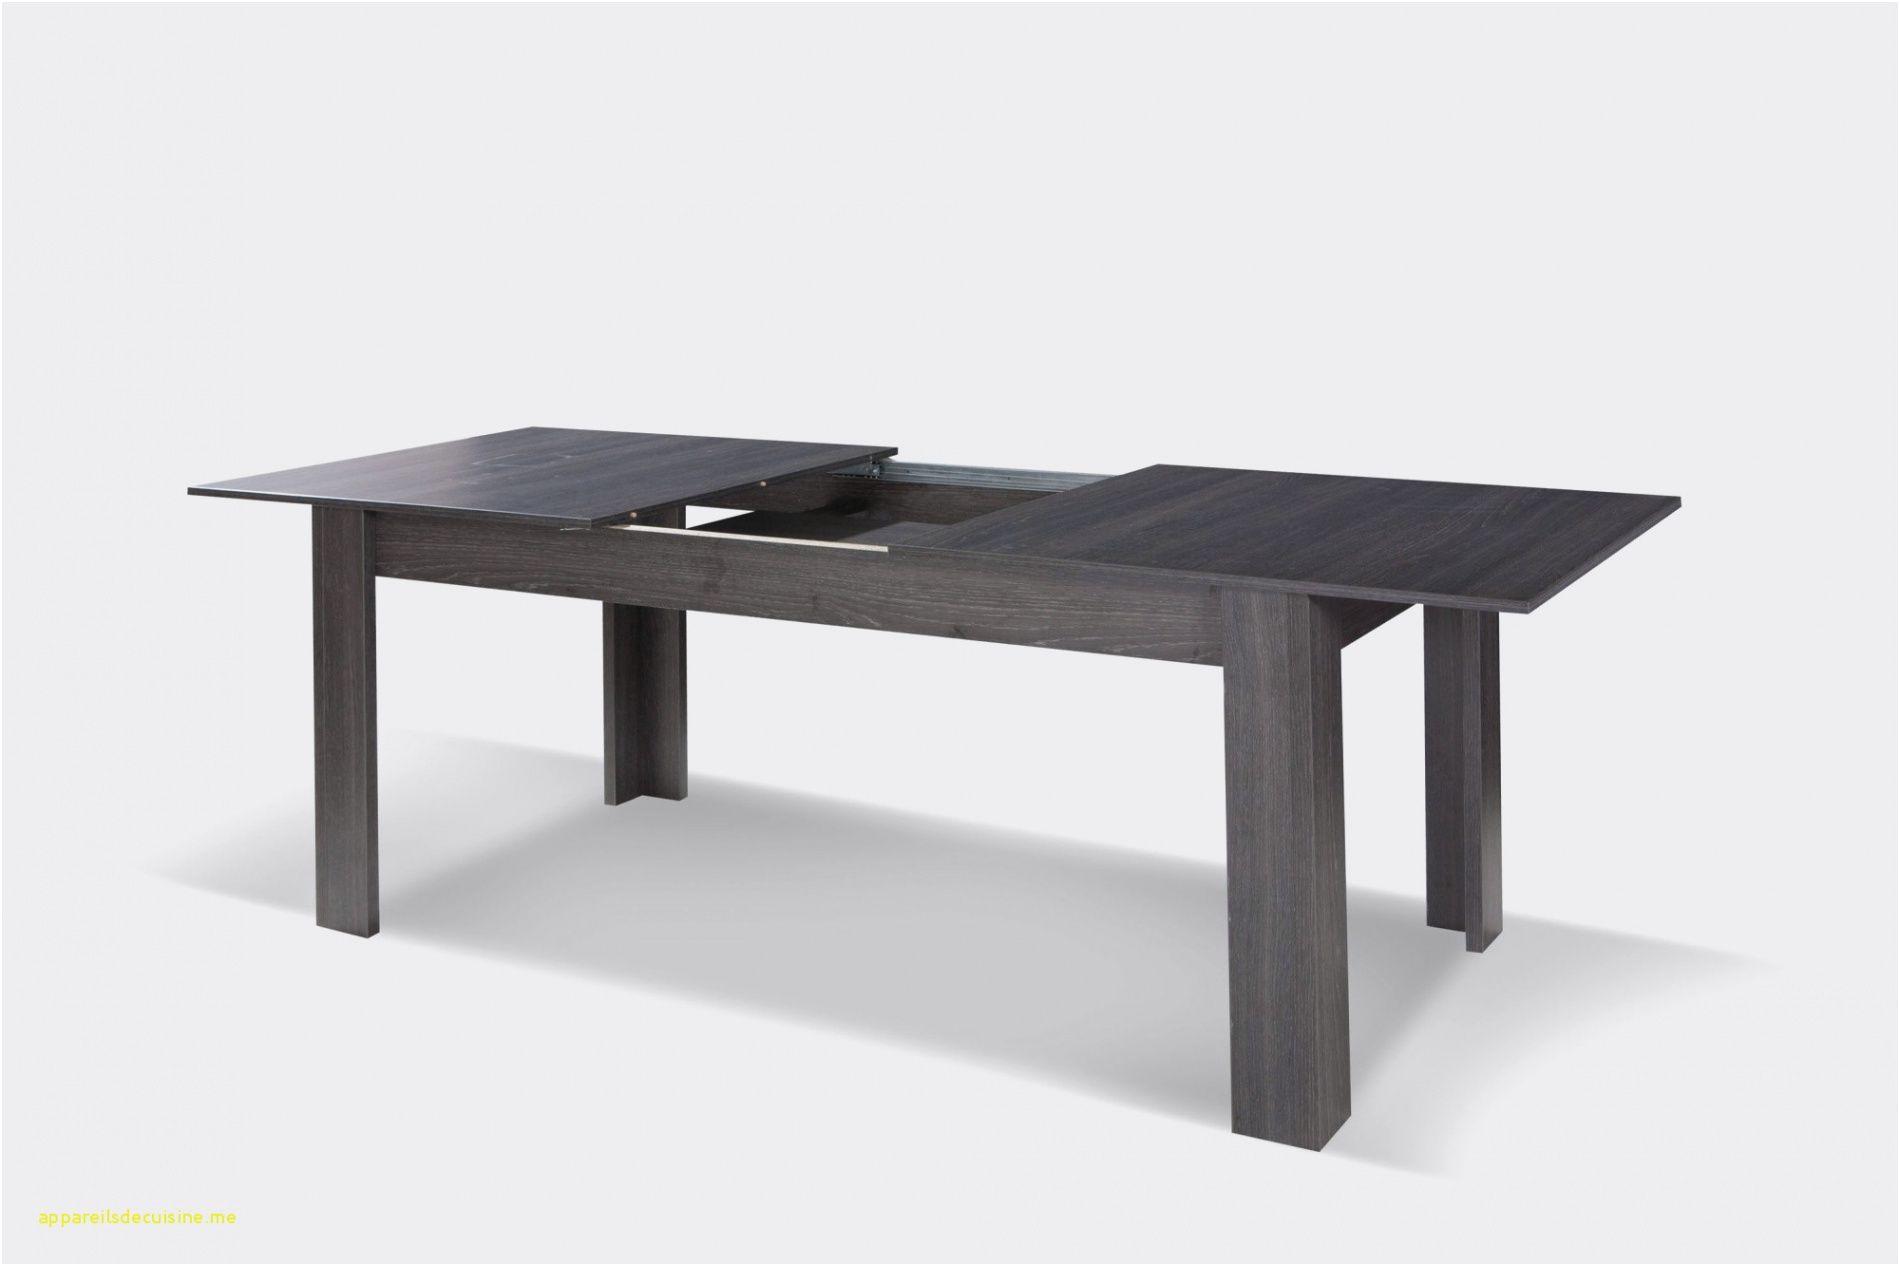 Table Bois Avec Rallonge Luxe Table Salle A Manger Bois Metal